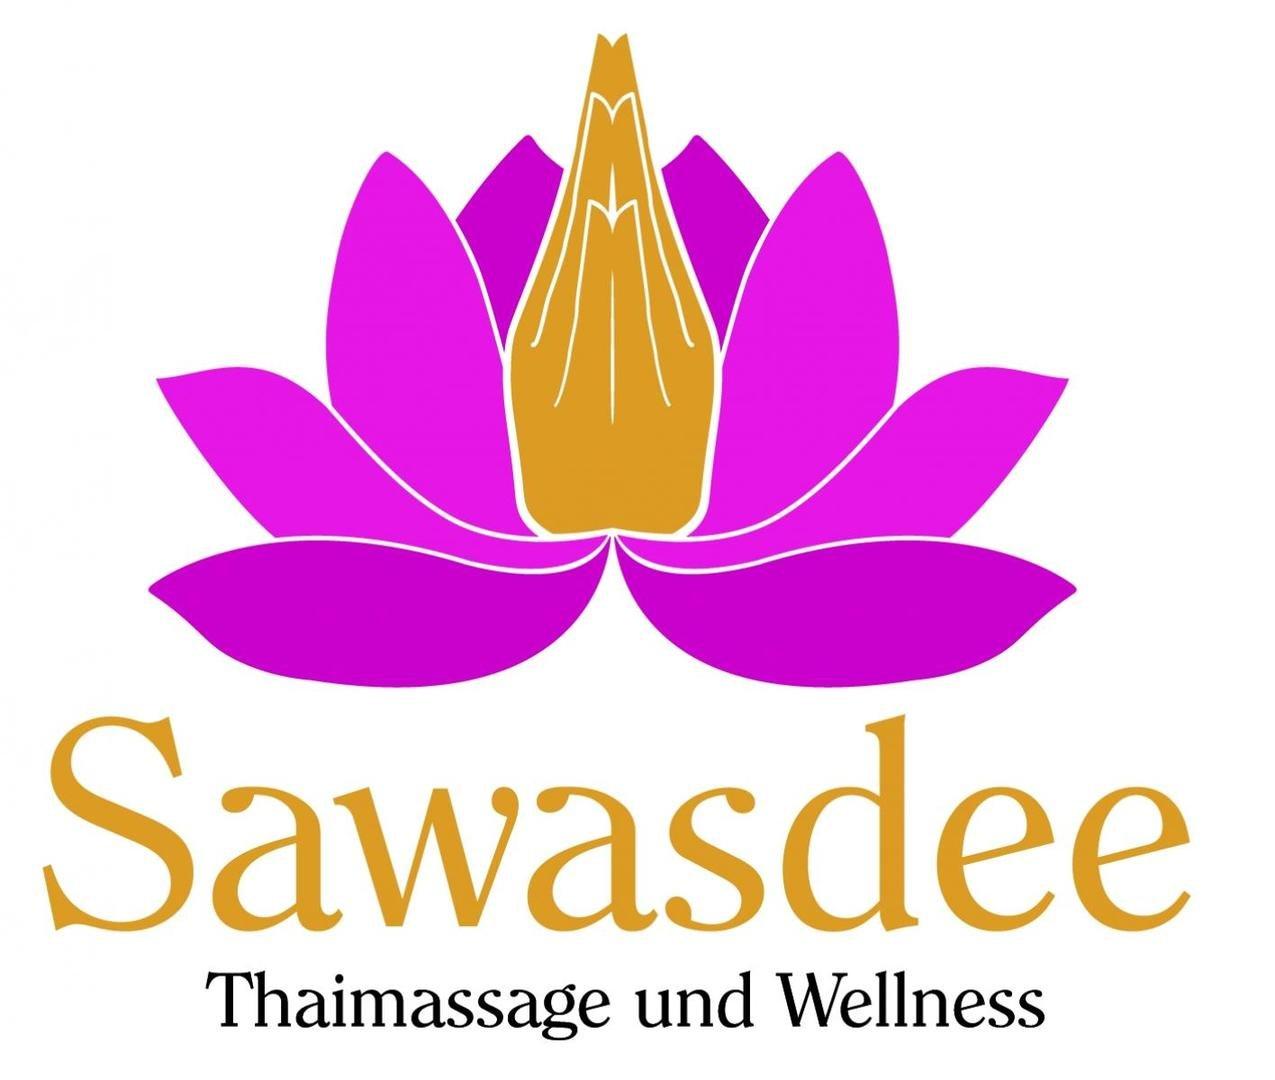 Sawasdee in Radevormwald auf Marktplatz-Mittelstand.de